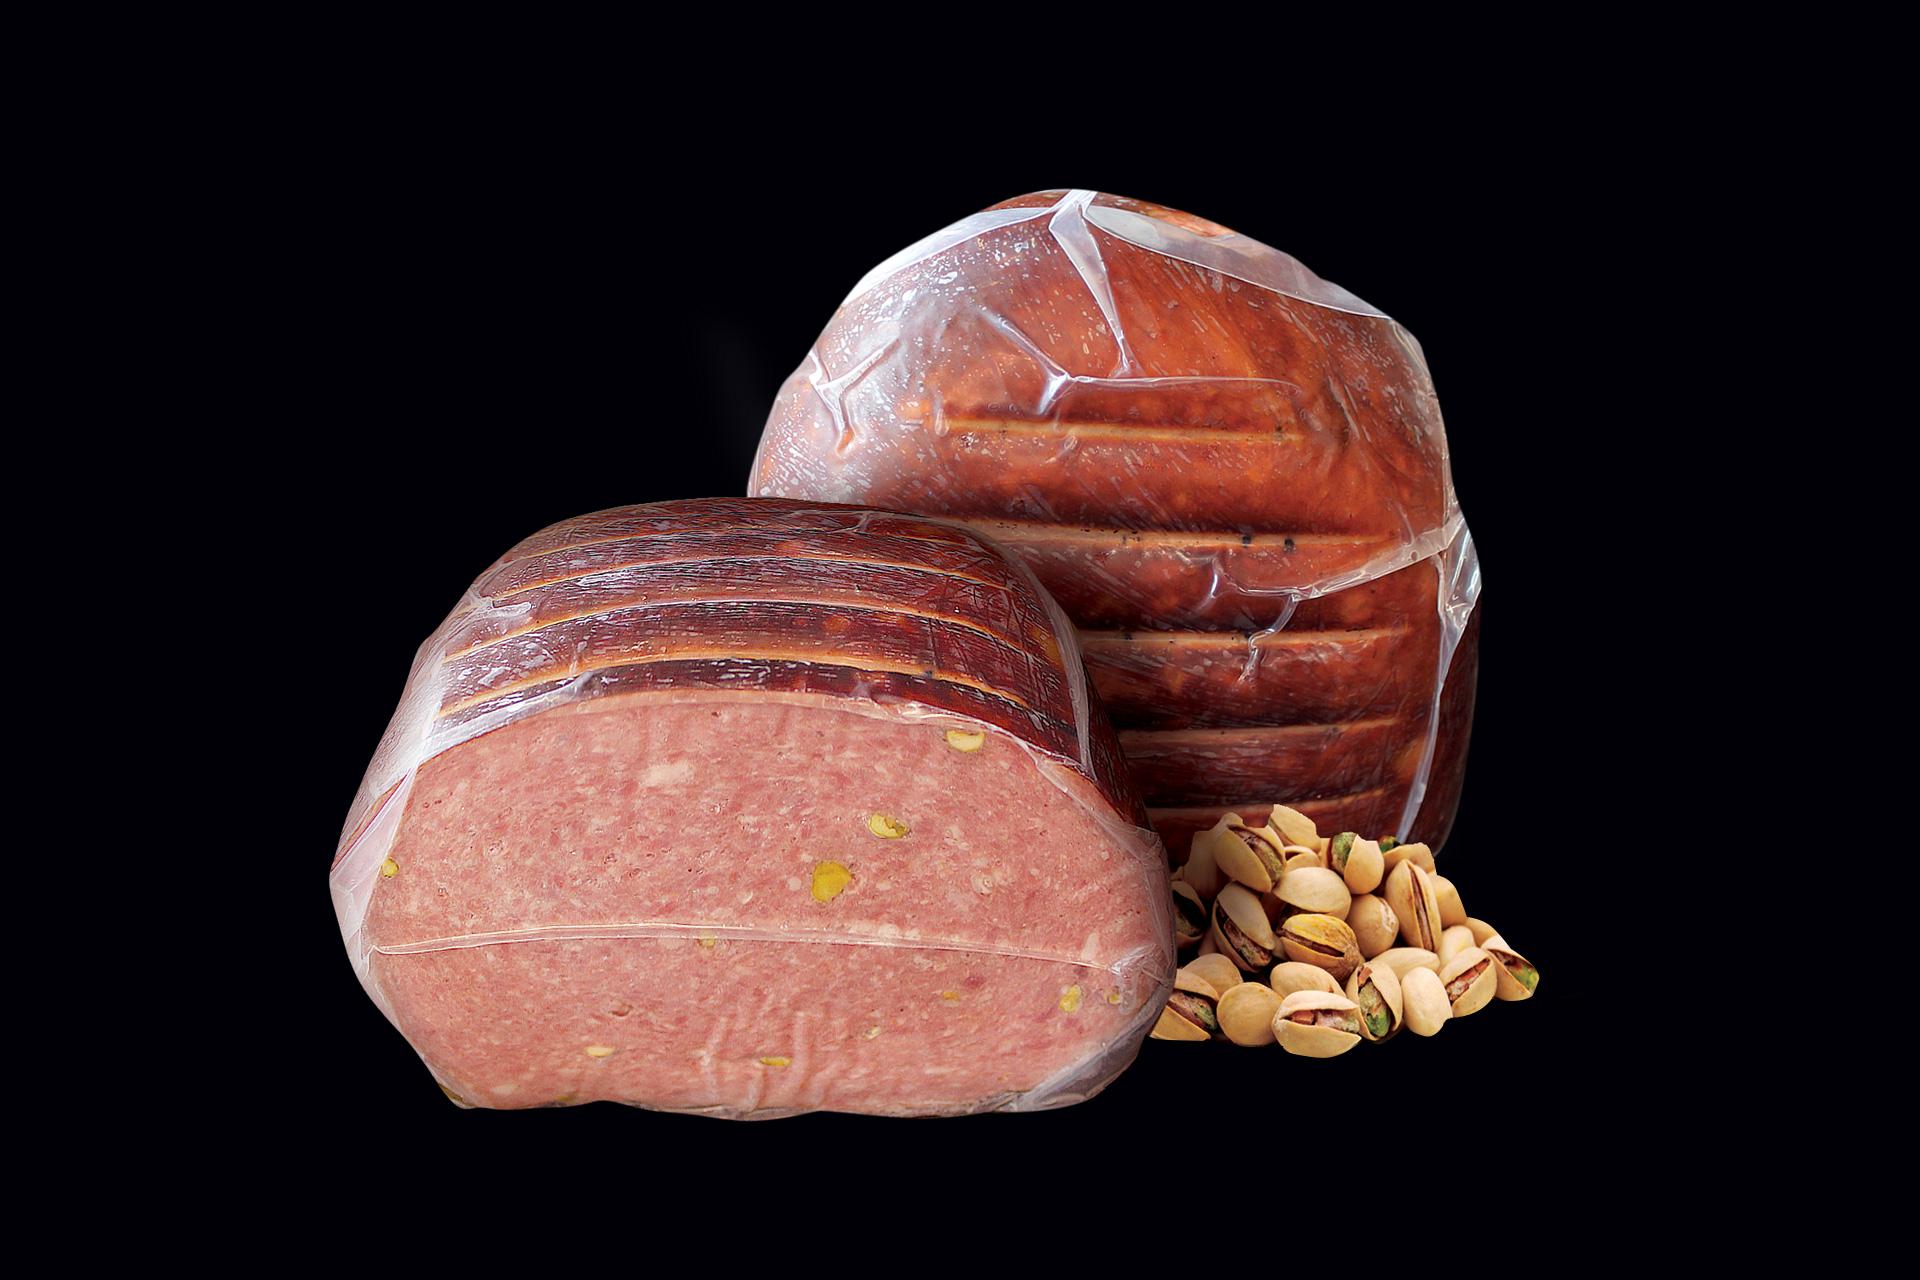 KERKINI FARM - Μορταδέλλα με Βουβαλίσιο Κρέας & Φυστίκι Αιγίνης Π.Ο.Π. 4Kg